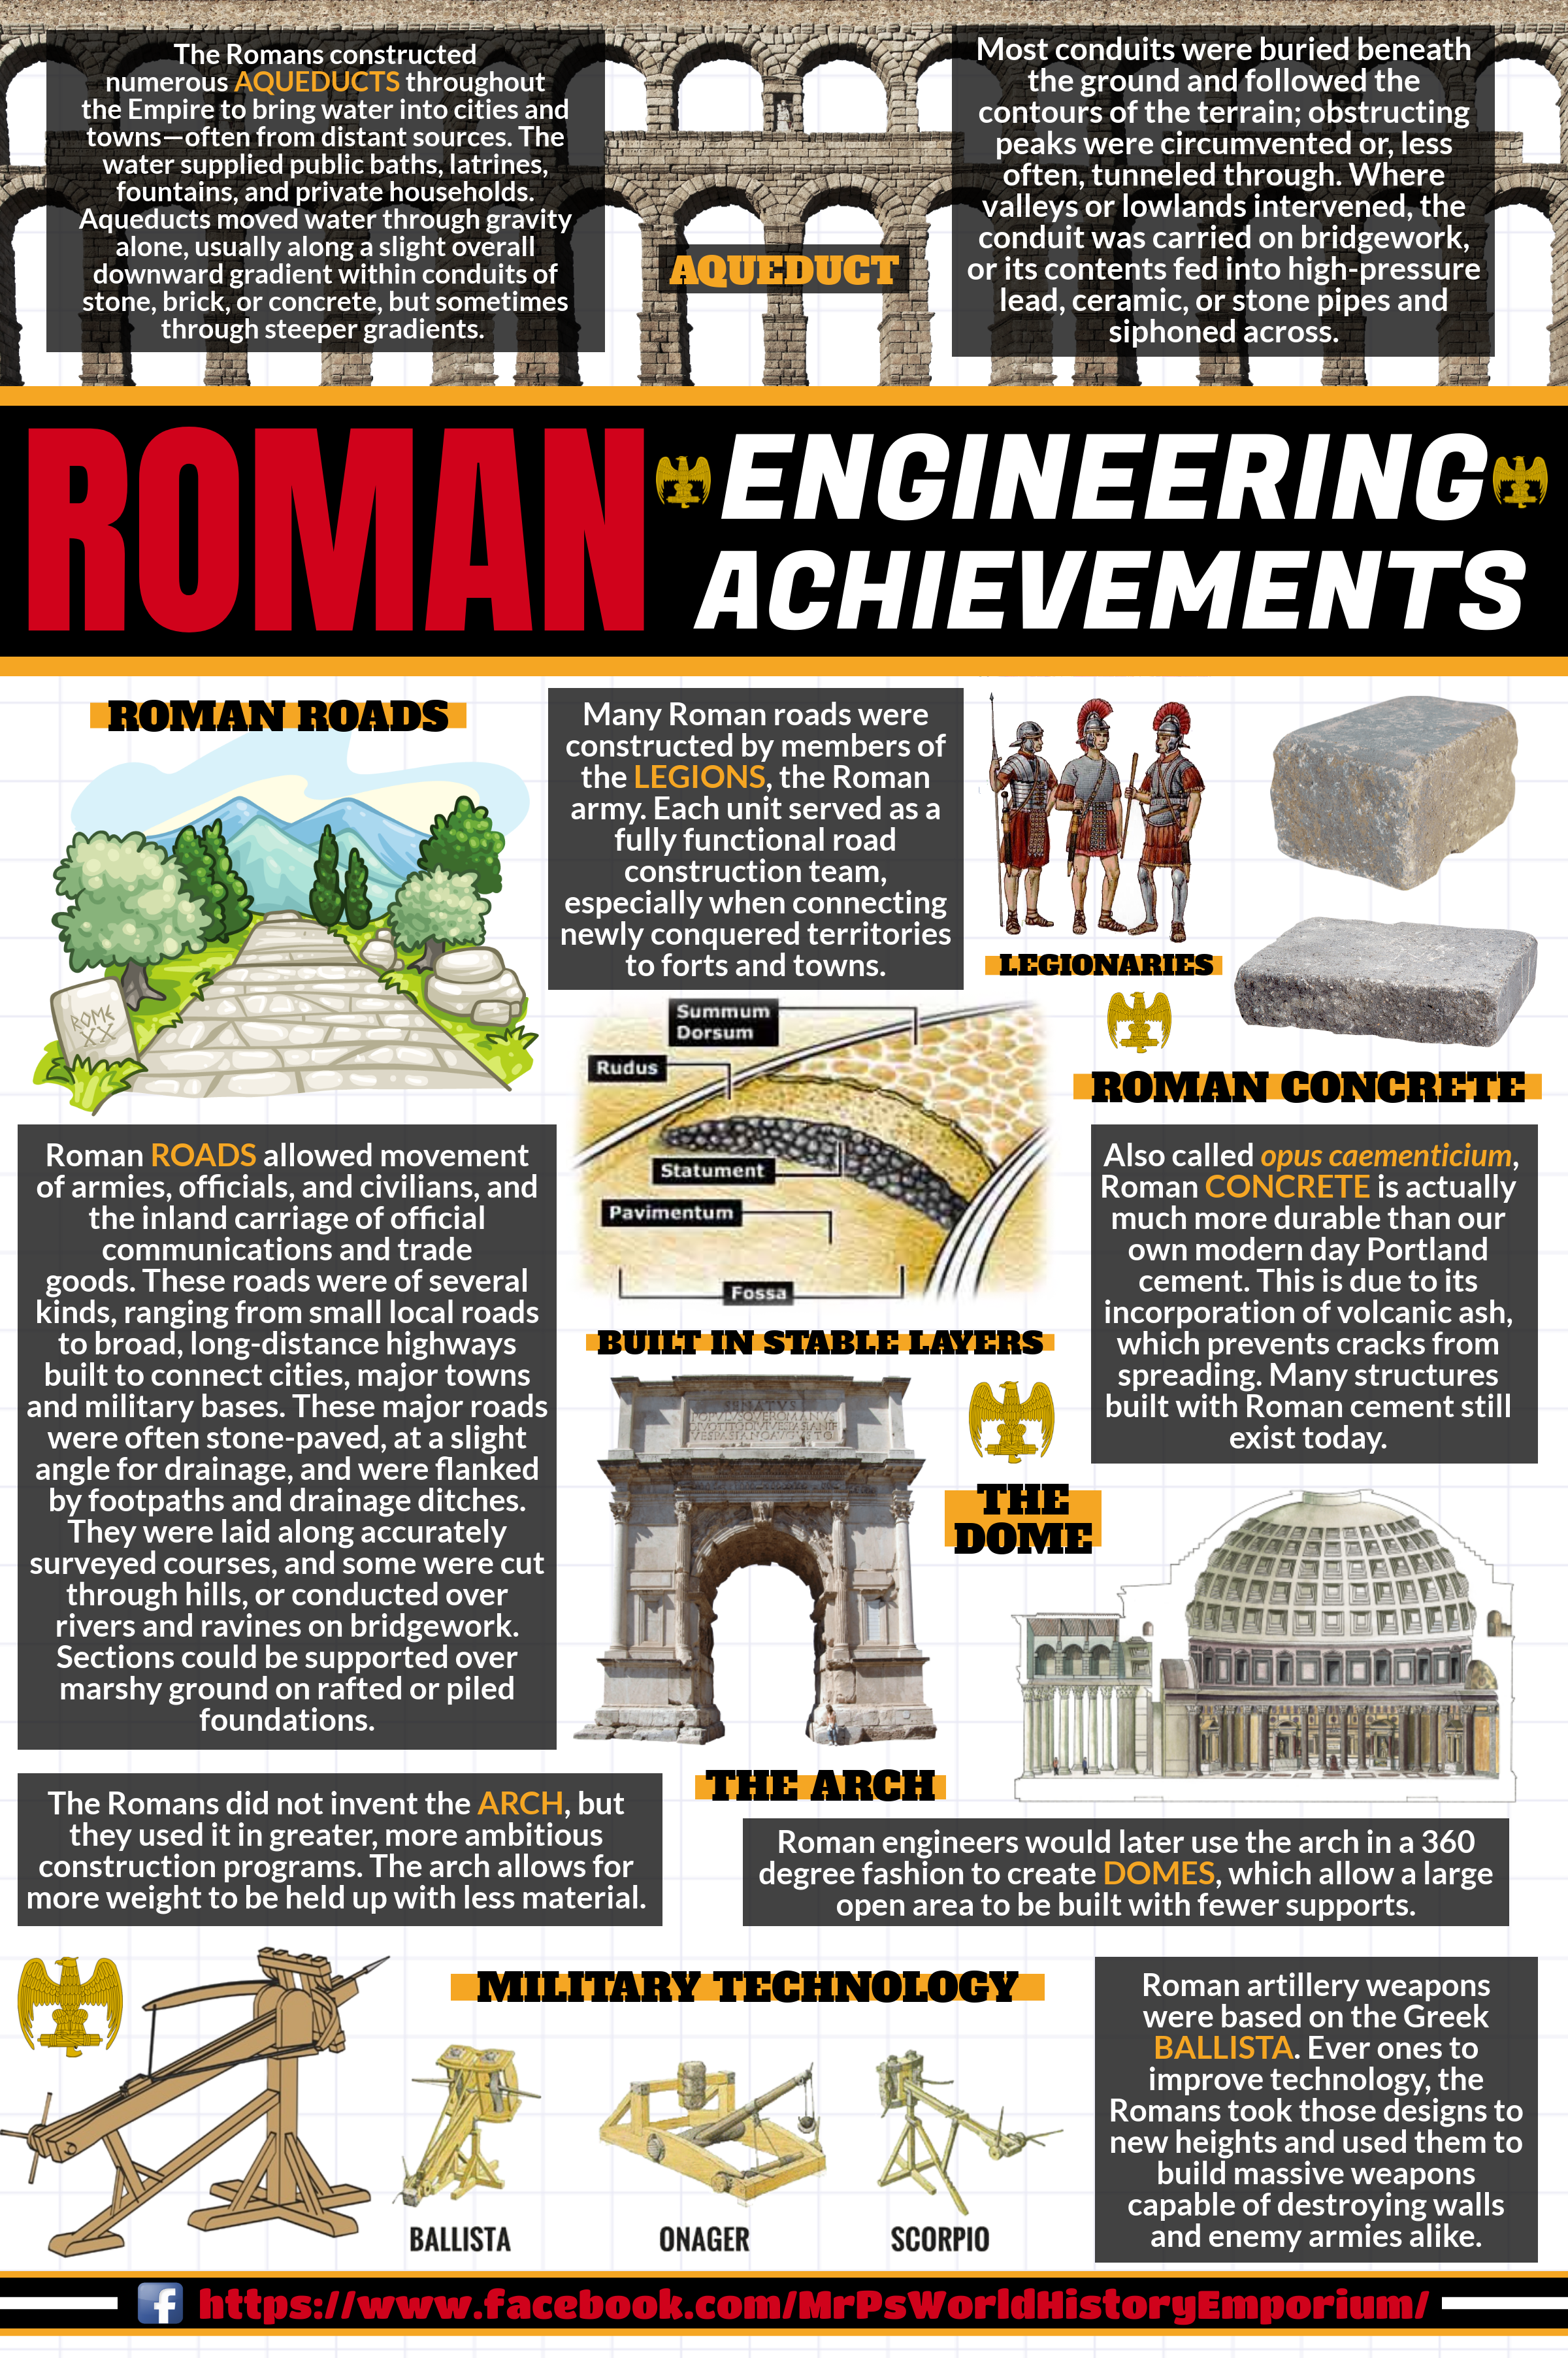 Engineering Achievements Of The Roman Empire Romanengineering Romanempire Engineering Infographic Ancient Roman History Rome History Ancient Rome History